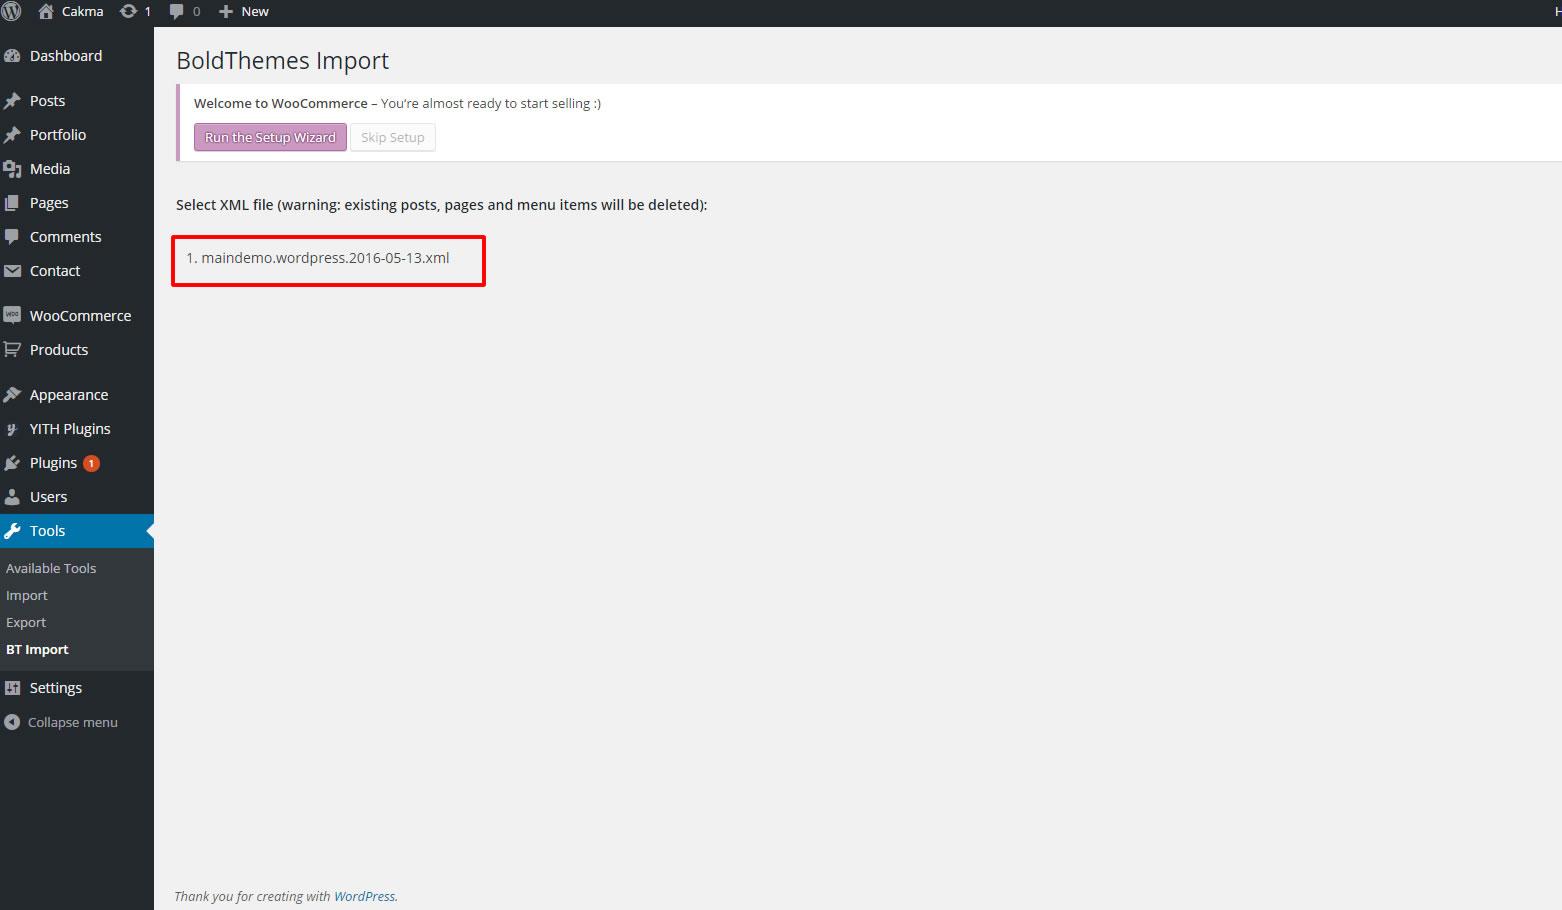 https://documentation.bold-themes.com/eventim/wp-content/uploads/sites/25/2016/07/9.jpg